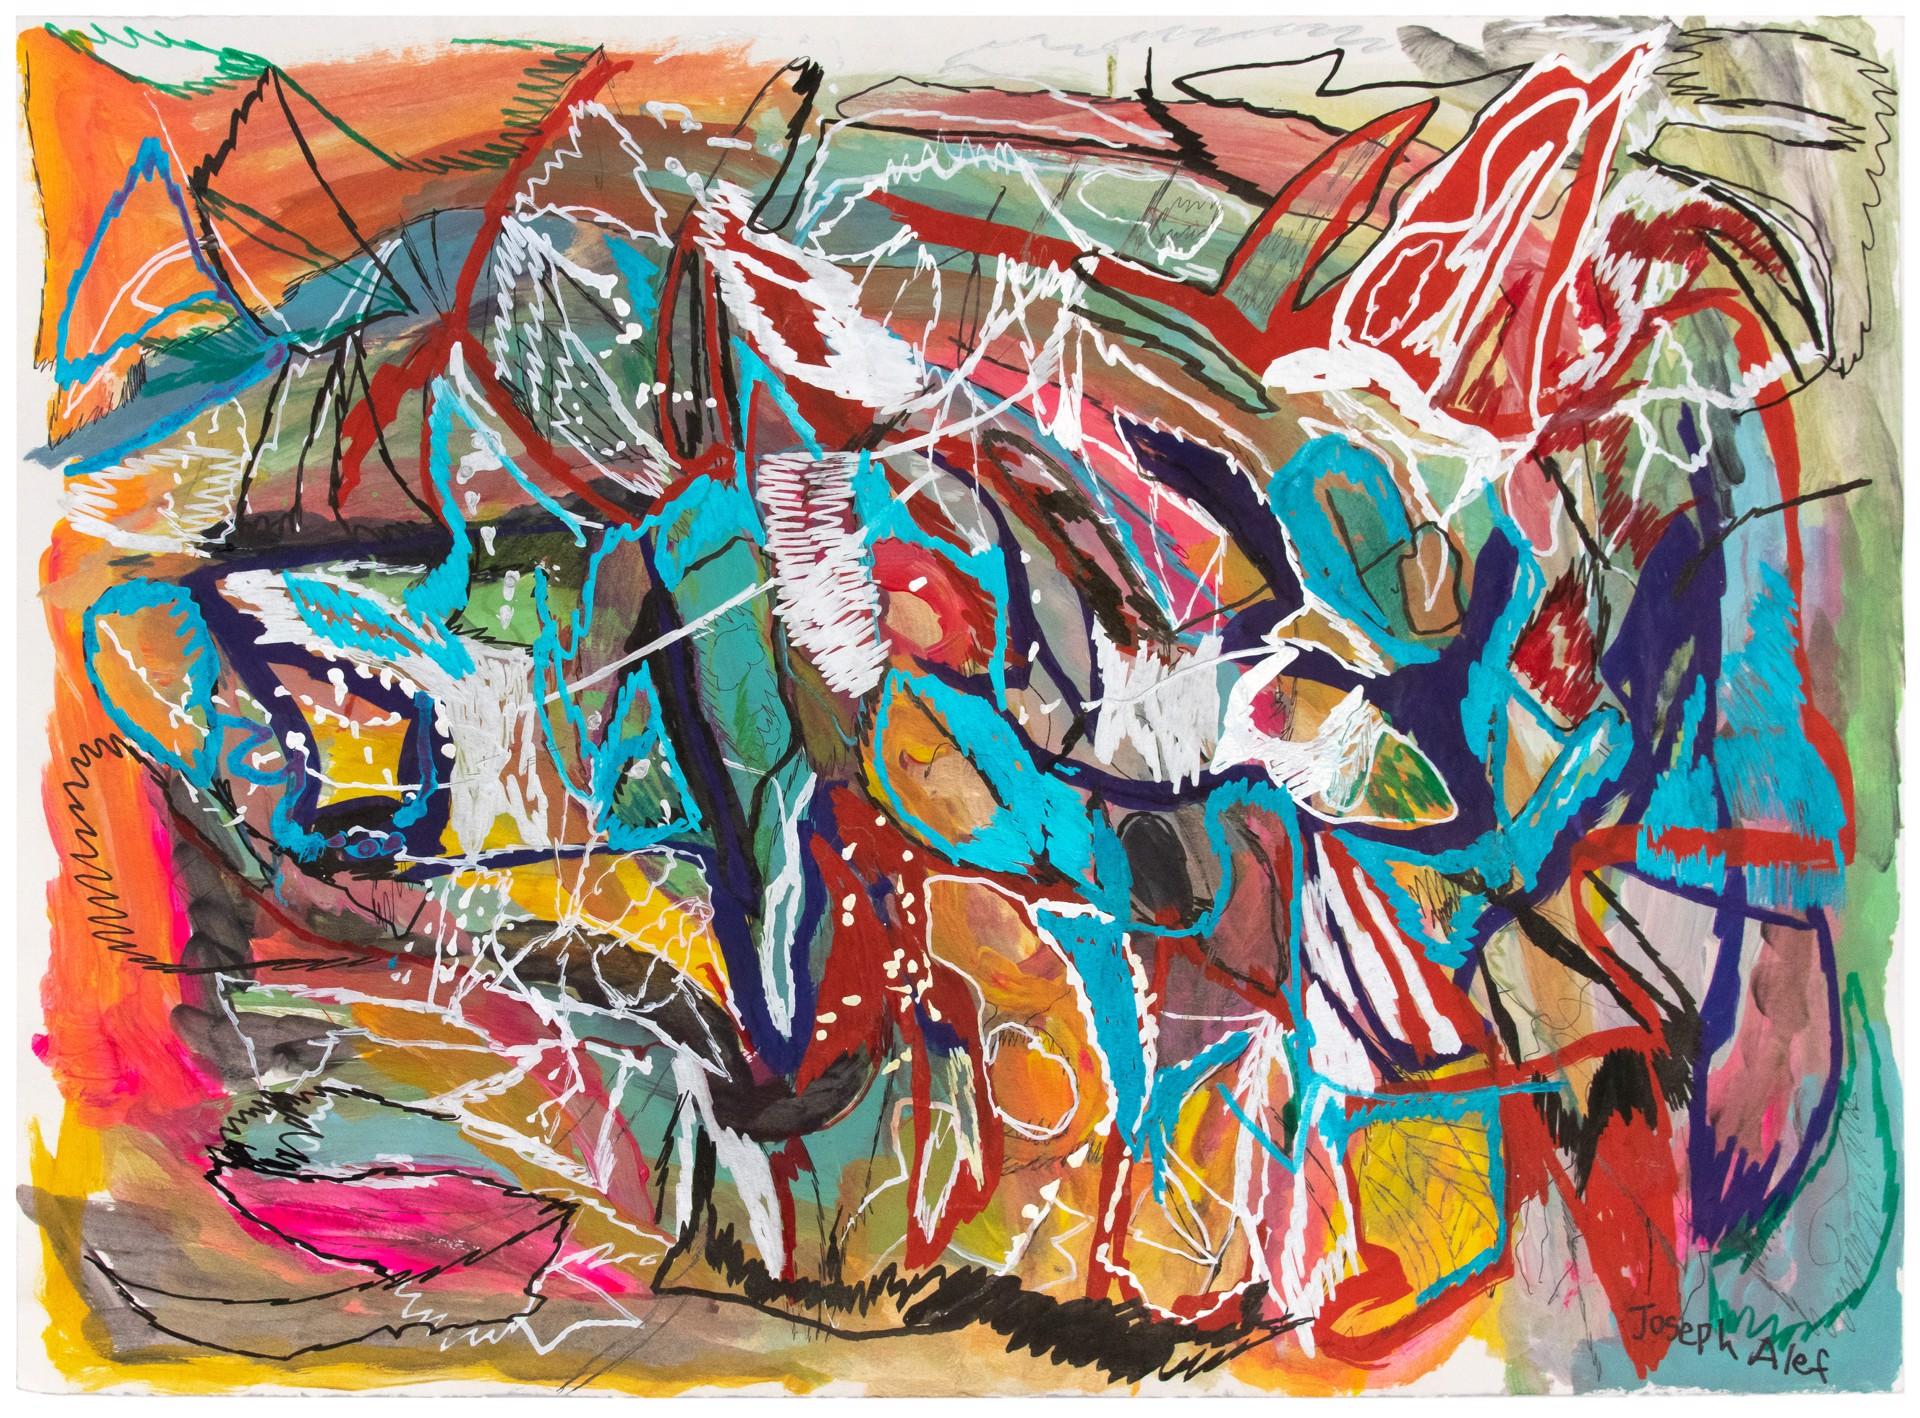 Joseph Alef - Untitled (JA 98) by Visiting Artist